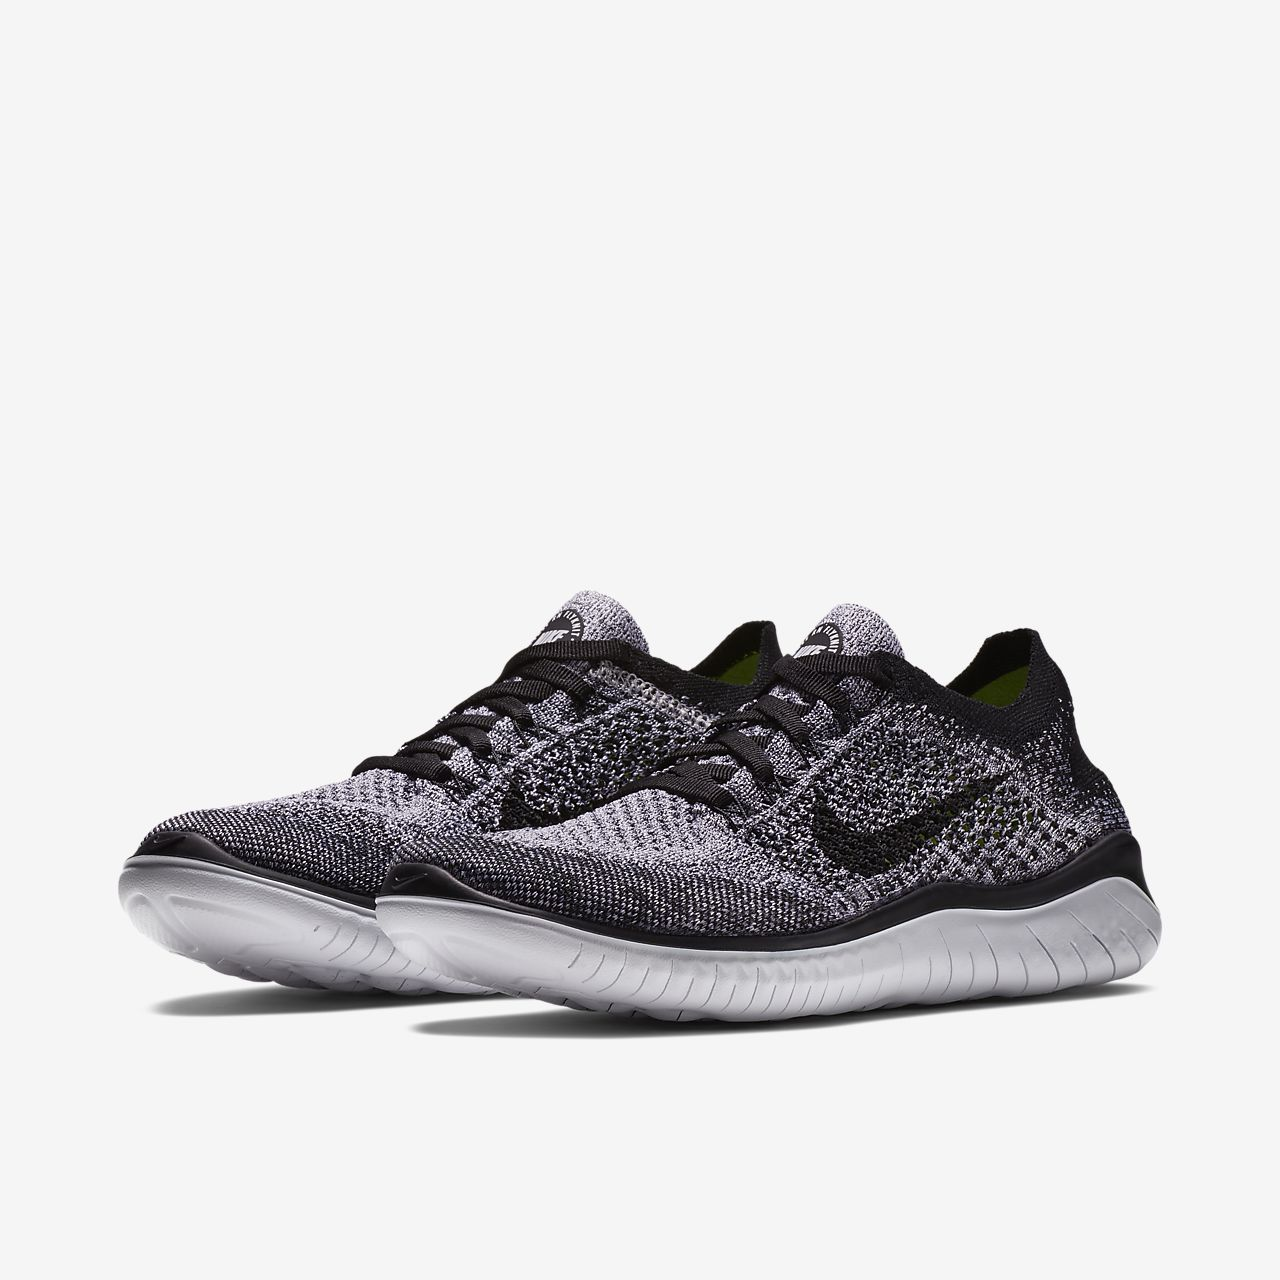 d361ab9397c2 Nike Free RN Flyknit 2018 Women s Running Shoe. Nike.com